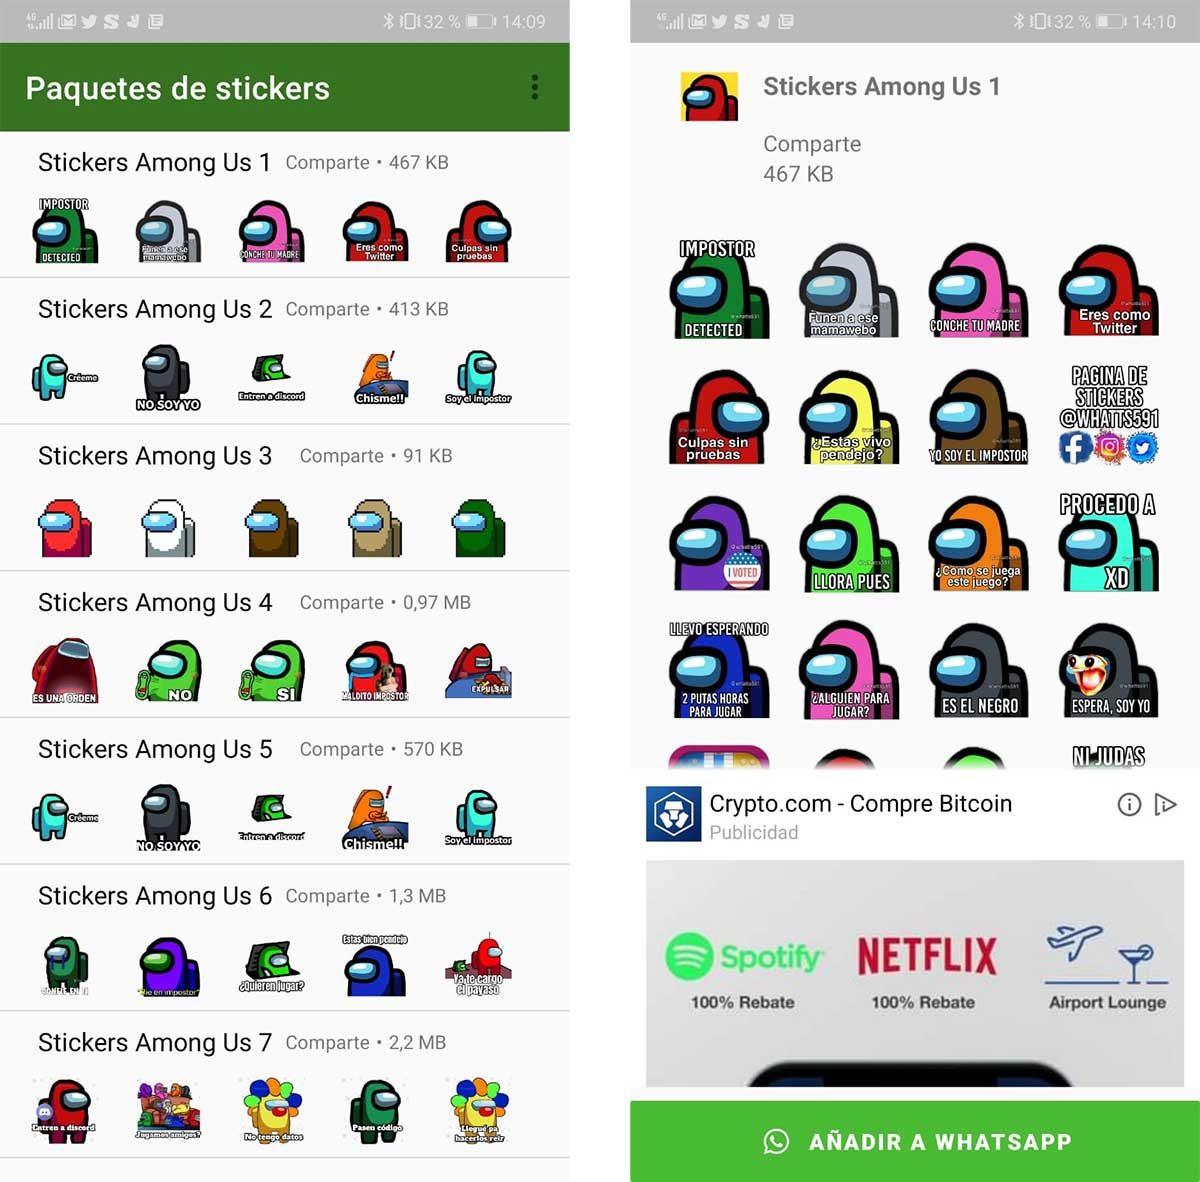 Los mejores stickers de Among Us para WhatsApp